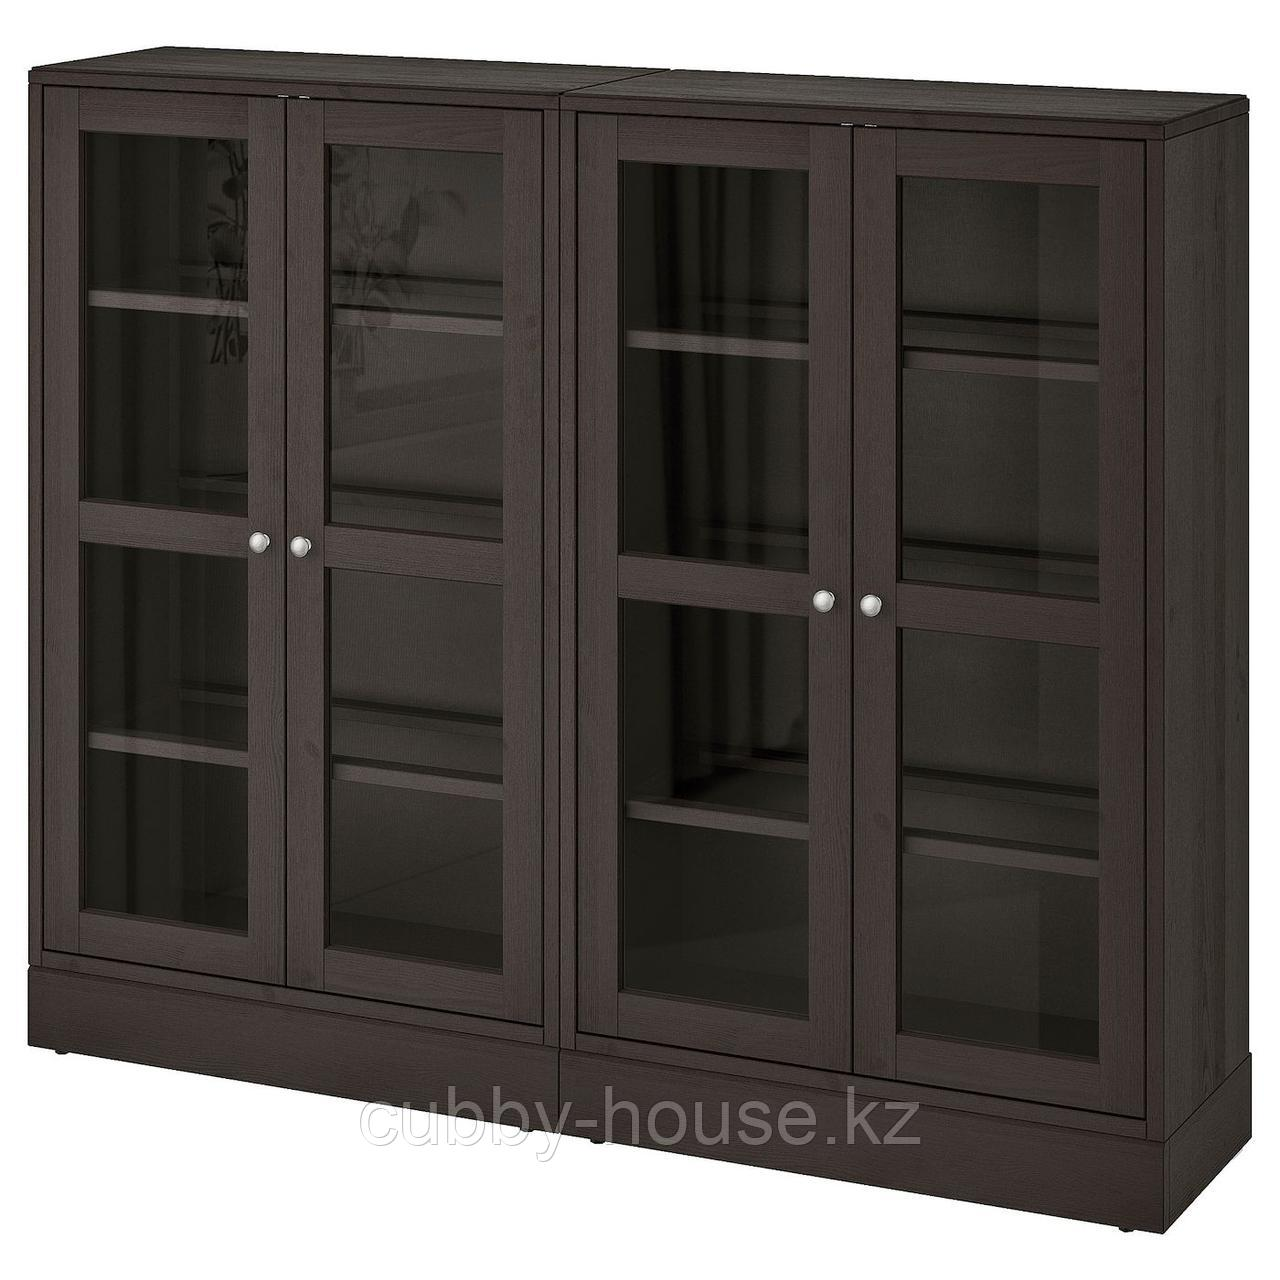 ХАВСТА Комбинация д/хранения+стекл дверц, серый, 162x37x134 см